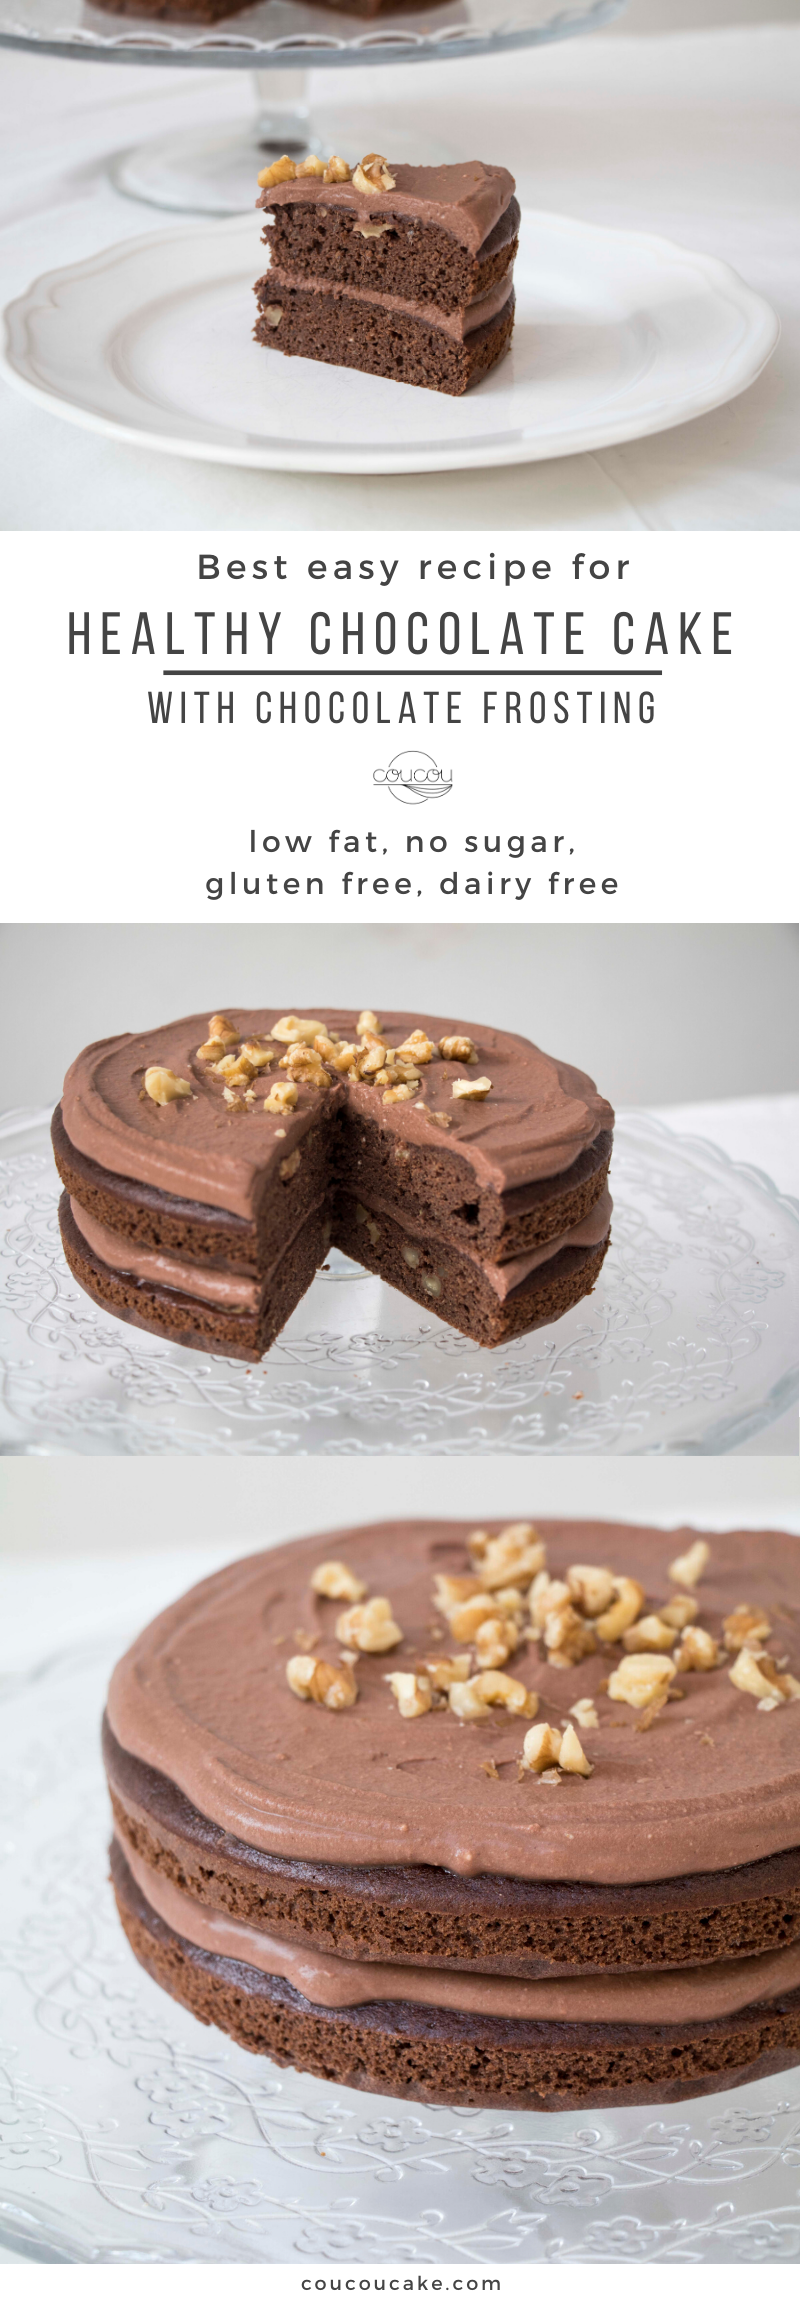 Healthy Chocolate Cake Recipe Coucoucake Cake And Baking Blog Recipe Healthy Chocolate Cake Healthy Chocolate Cake Recipe Healthy Chocolate